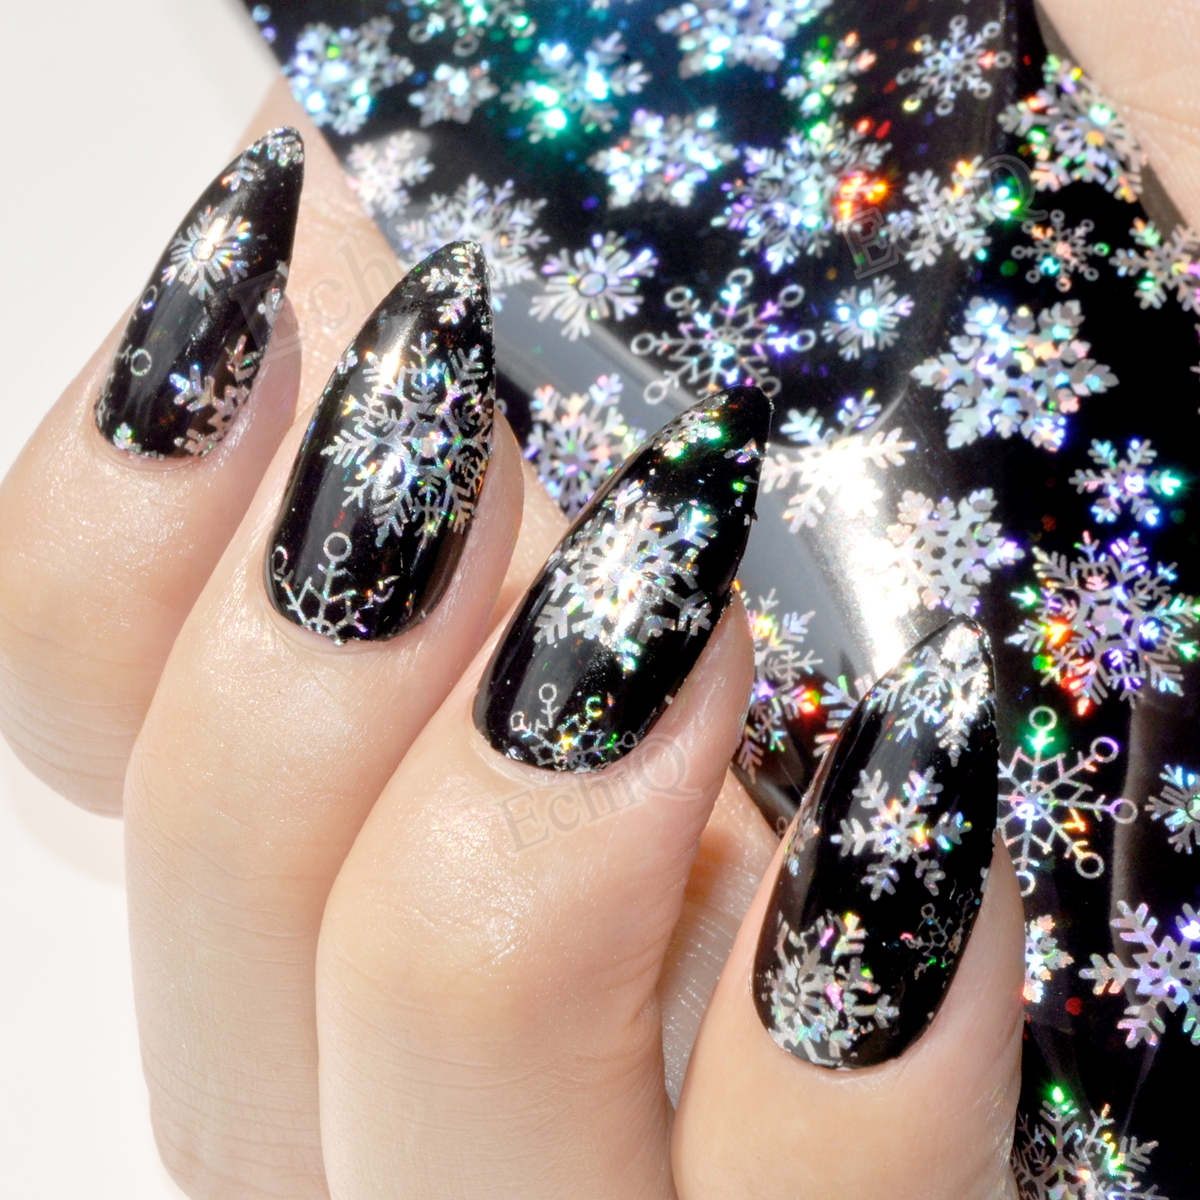 самом картинки со снежинками на ногтях стесняйтесь хотя оживите